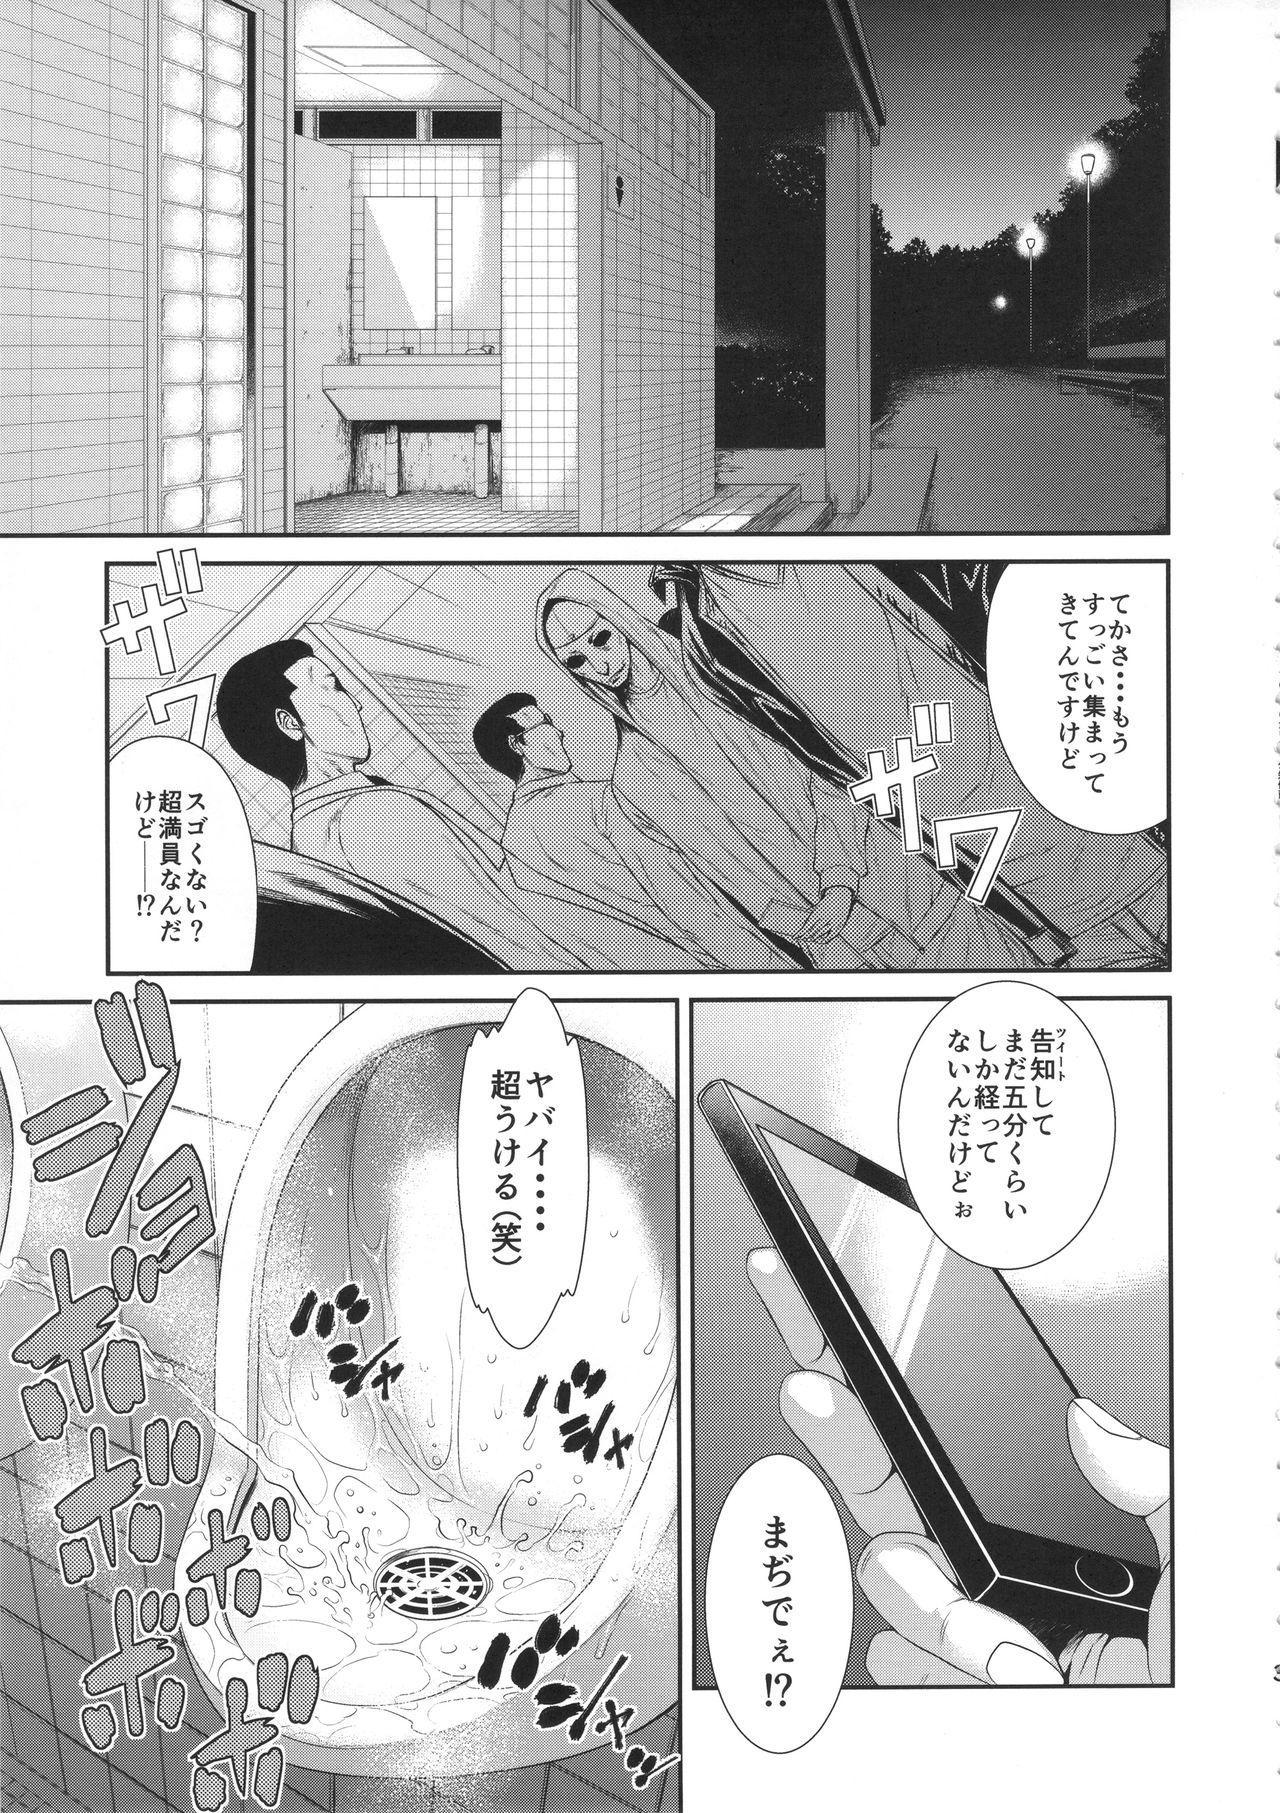 TOKYO Charisma Koushuu Benjo Part. 3 - Tokyo Charismatic Public Lavatory 1